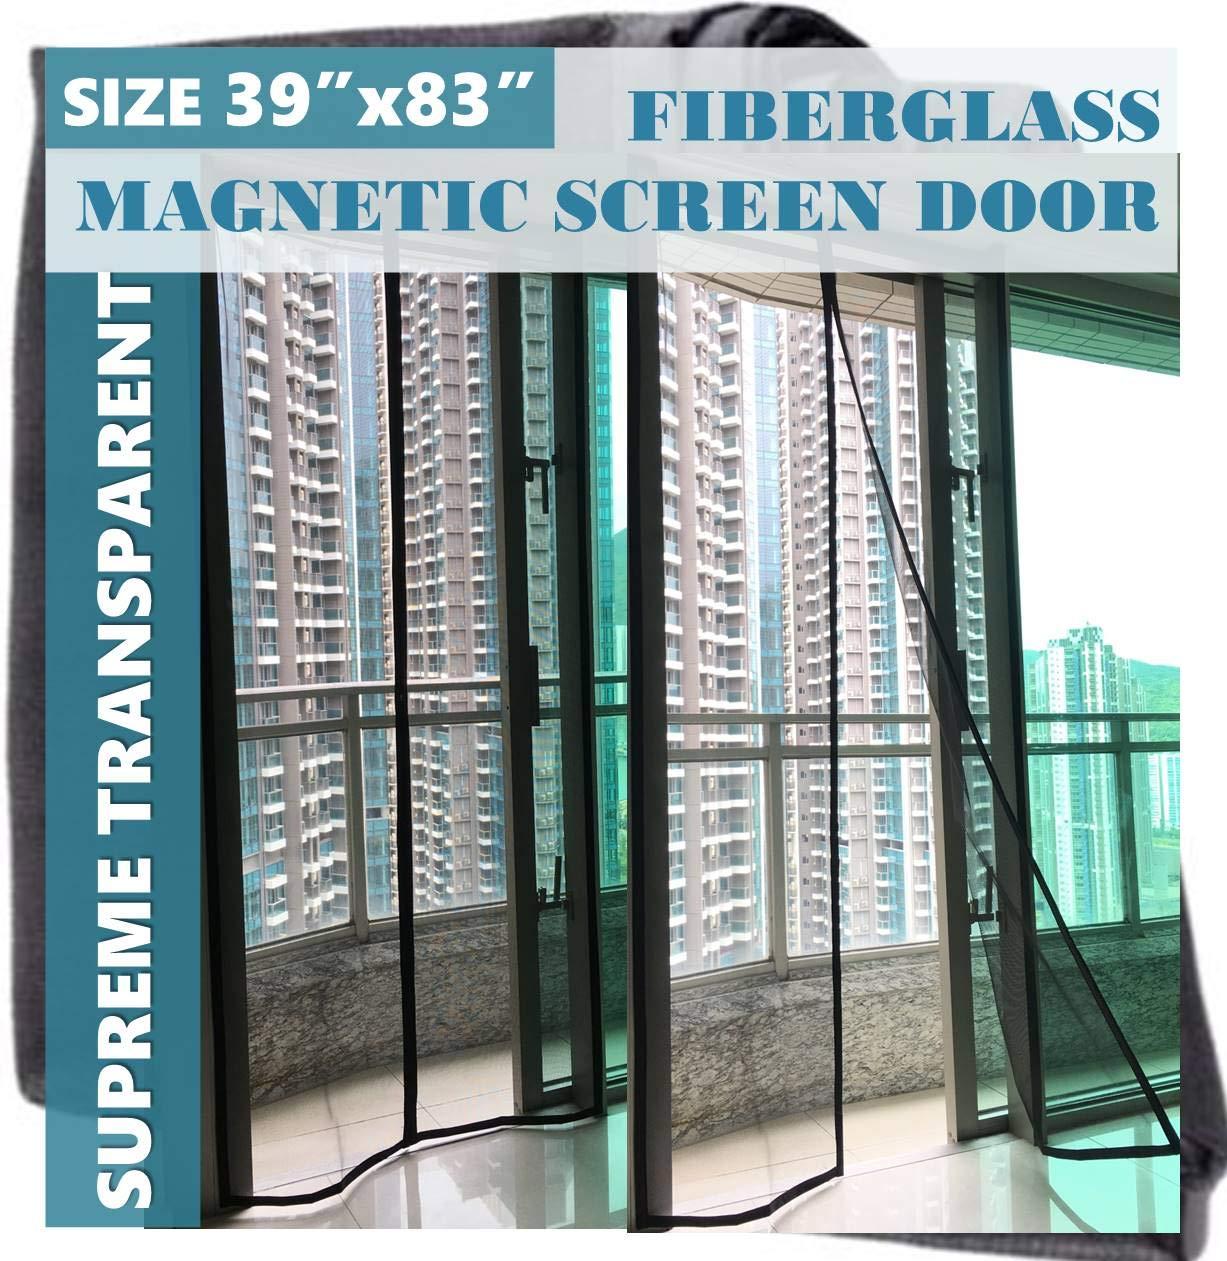 F.S. Luxurious Magnetic Screen Door Fiberglass Upgraded Mosquito Bug Off Screen Curtain Full Frame Hook and Loop Tape Mesh Insect Net Size 39x83 for Patio Door French Door Sliding Glass Door 38 x 82